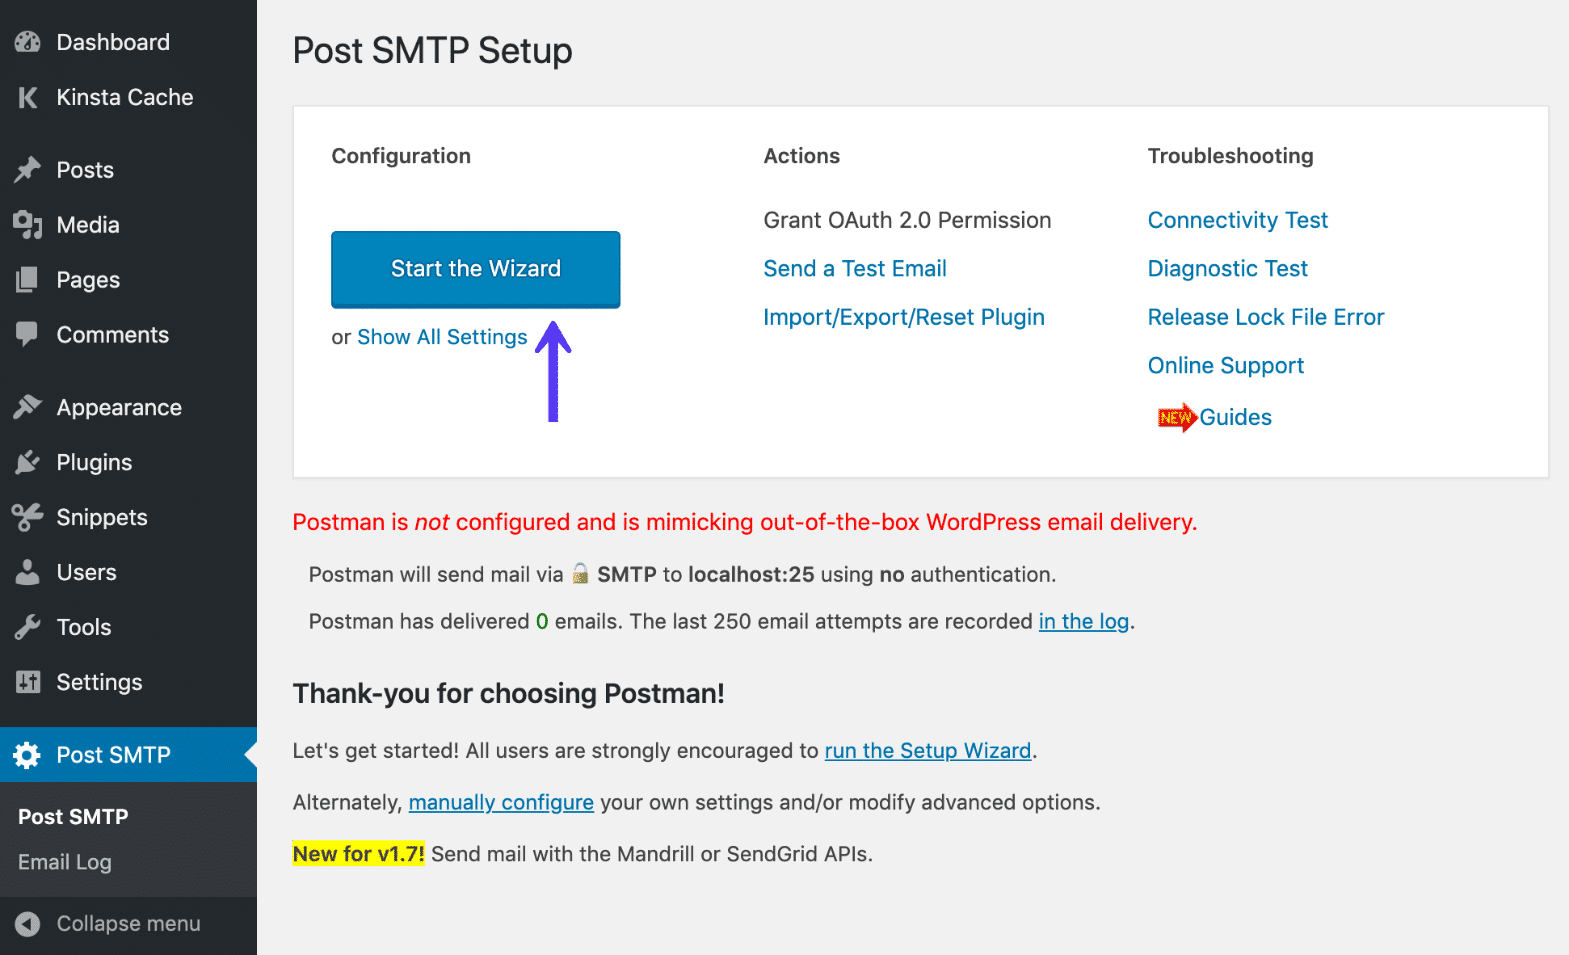 Post SMTP wizard